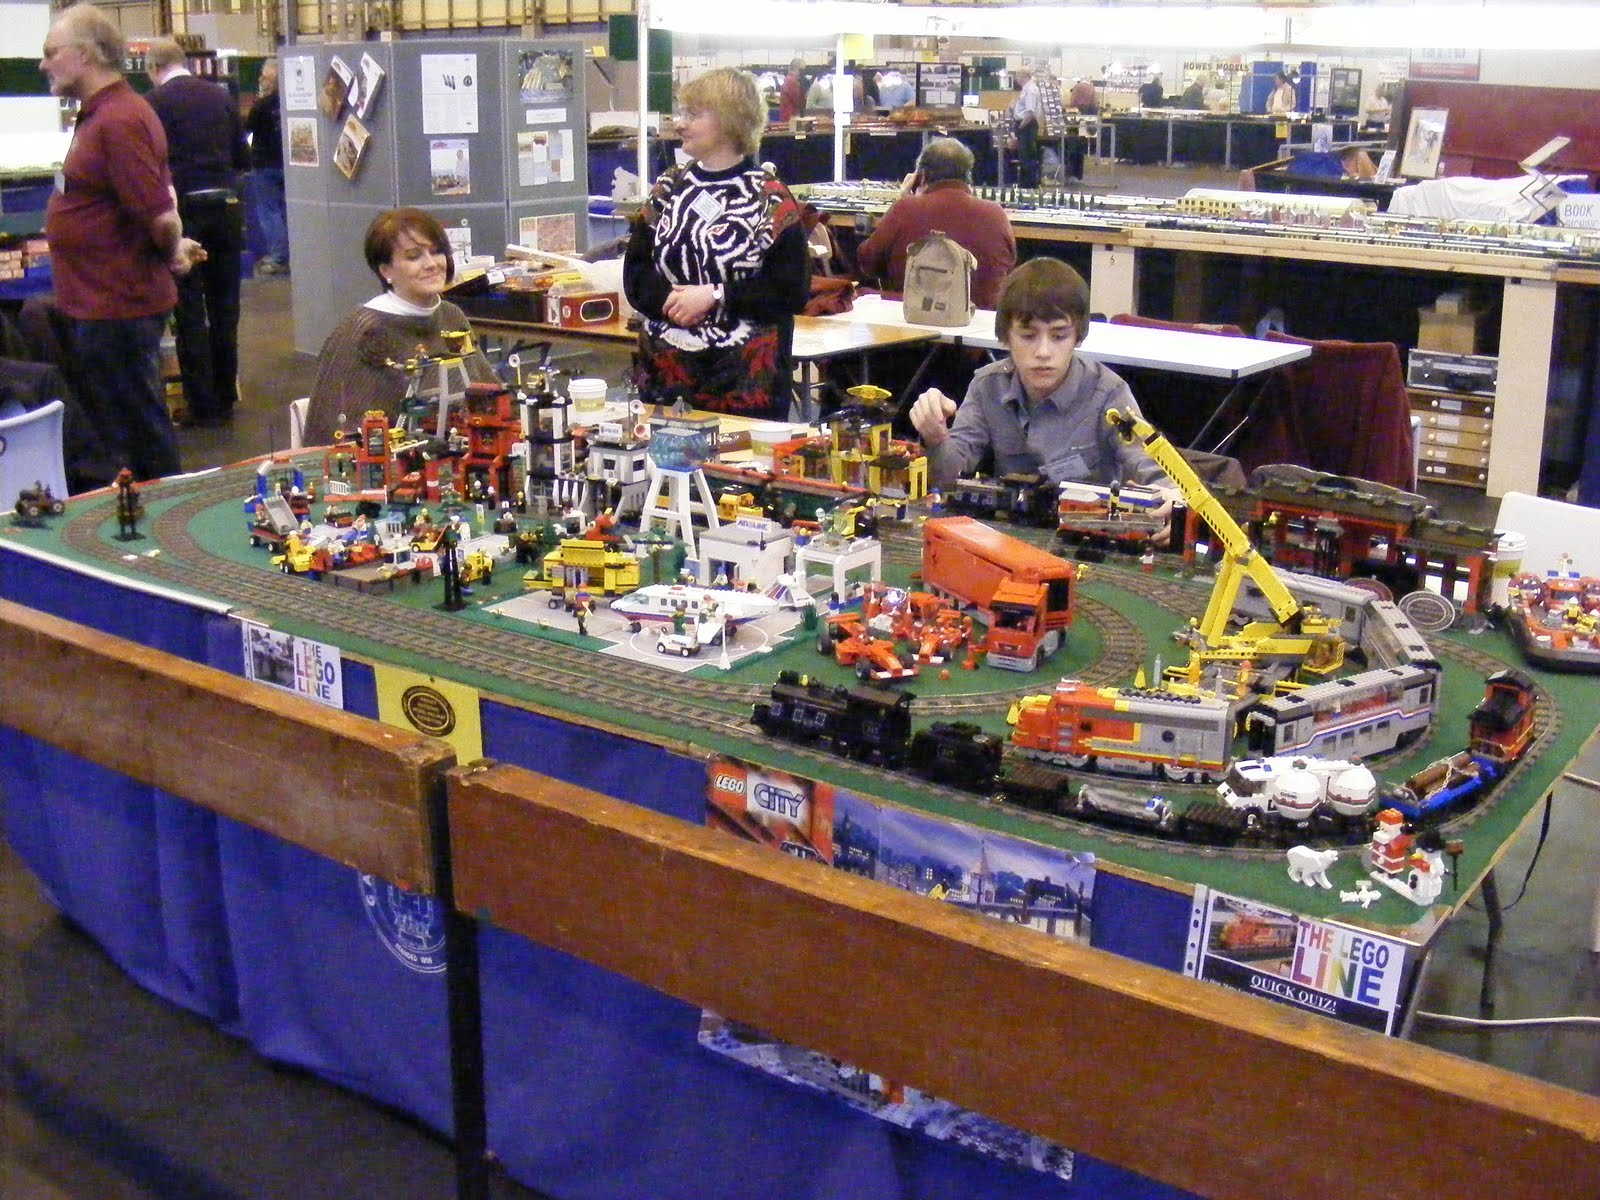 sam\u0027s world lego railway at the warley national model railwaythis weekend we exhibited at the 2010 warley national model railway exhibition,